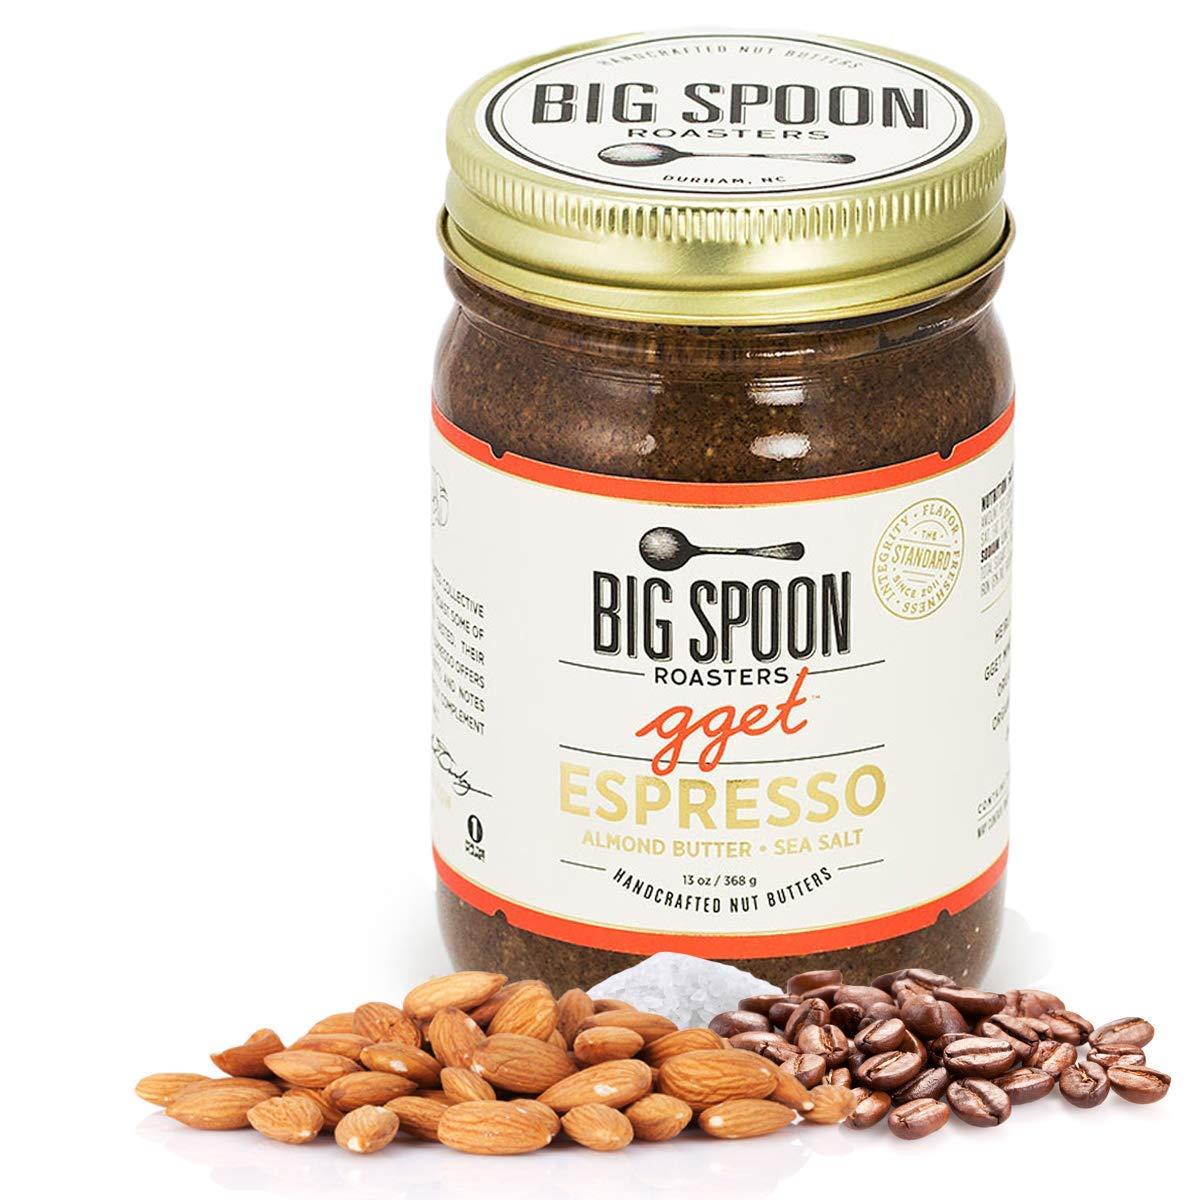 Big Spoon Roasters Espresso Almond Butter - F With 40% OFF Cheap Sale Sea Keto Salt Max 59% OFF